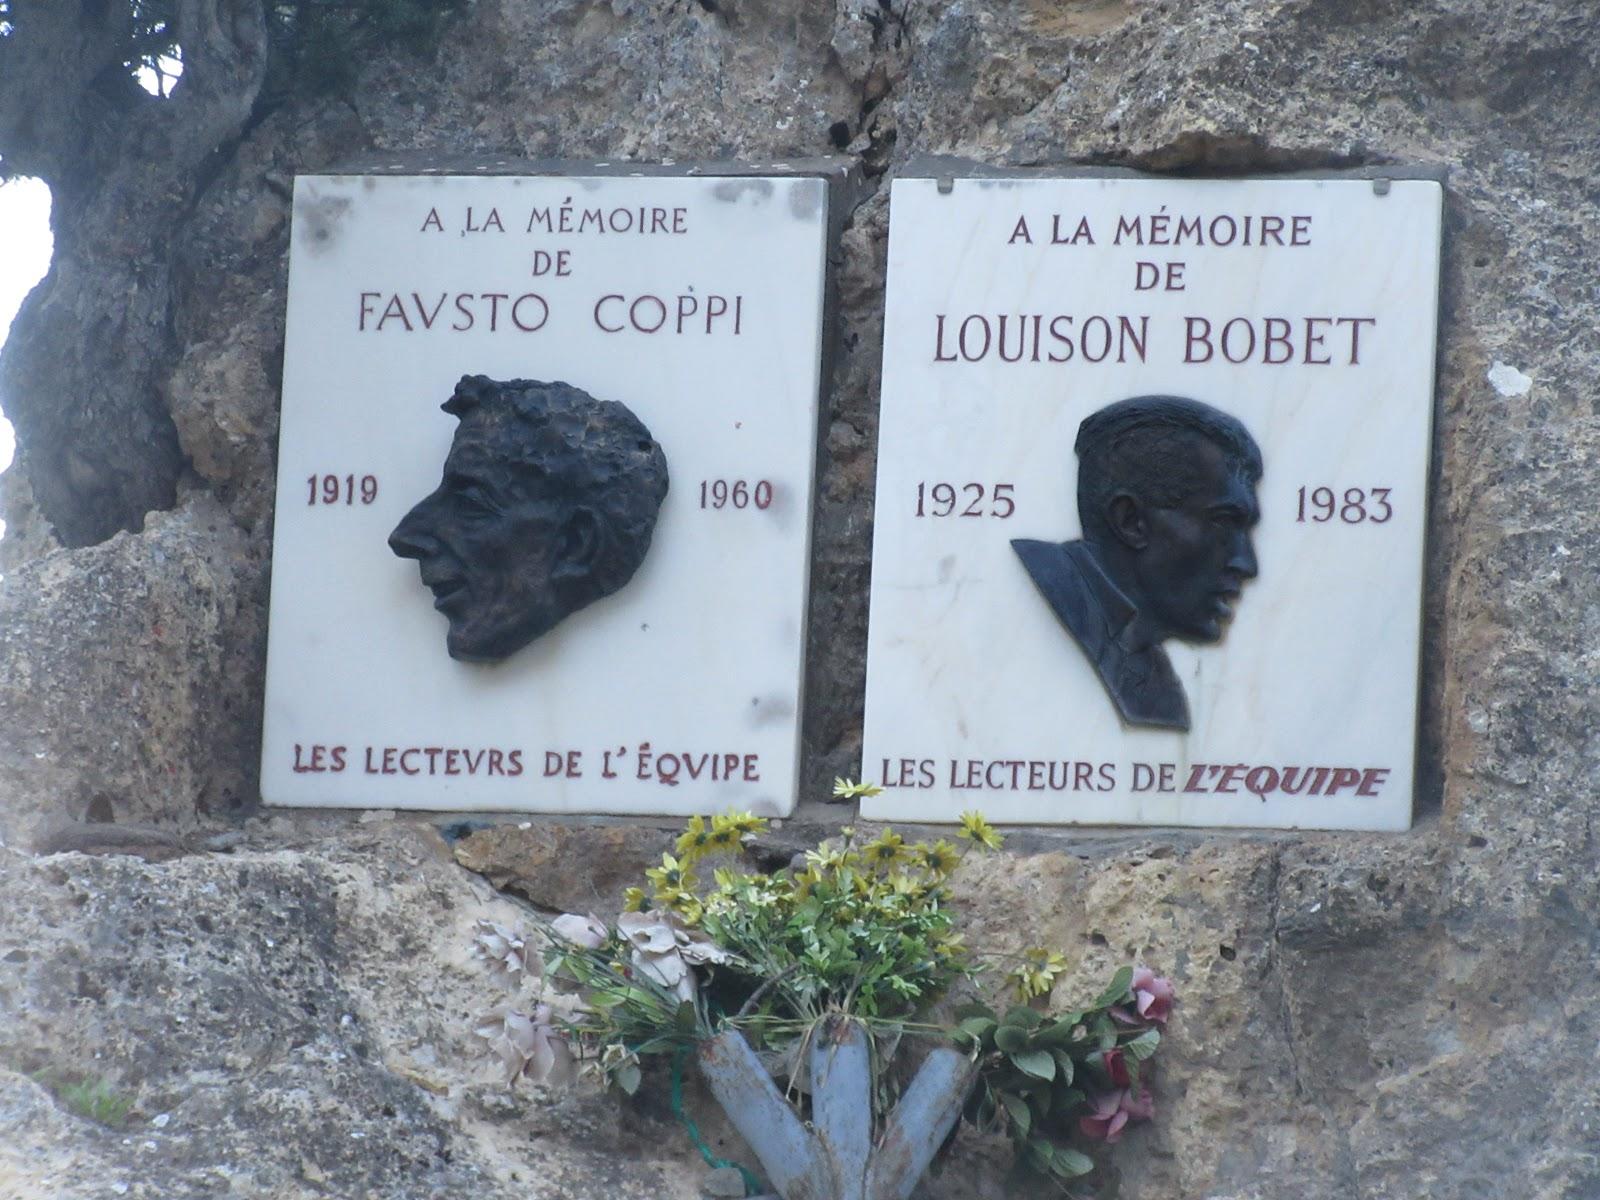 Bike climb of Col d'Izoard from Briancon - memorial of Fausto Coppi and Louiso Bobet at the col